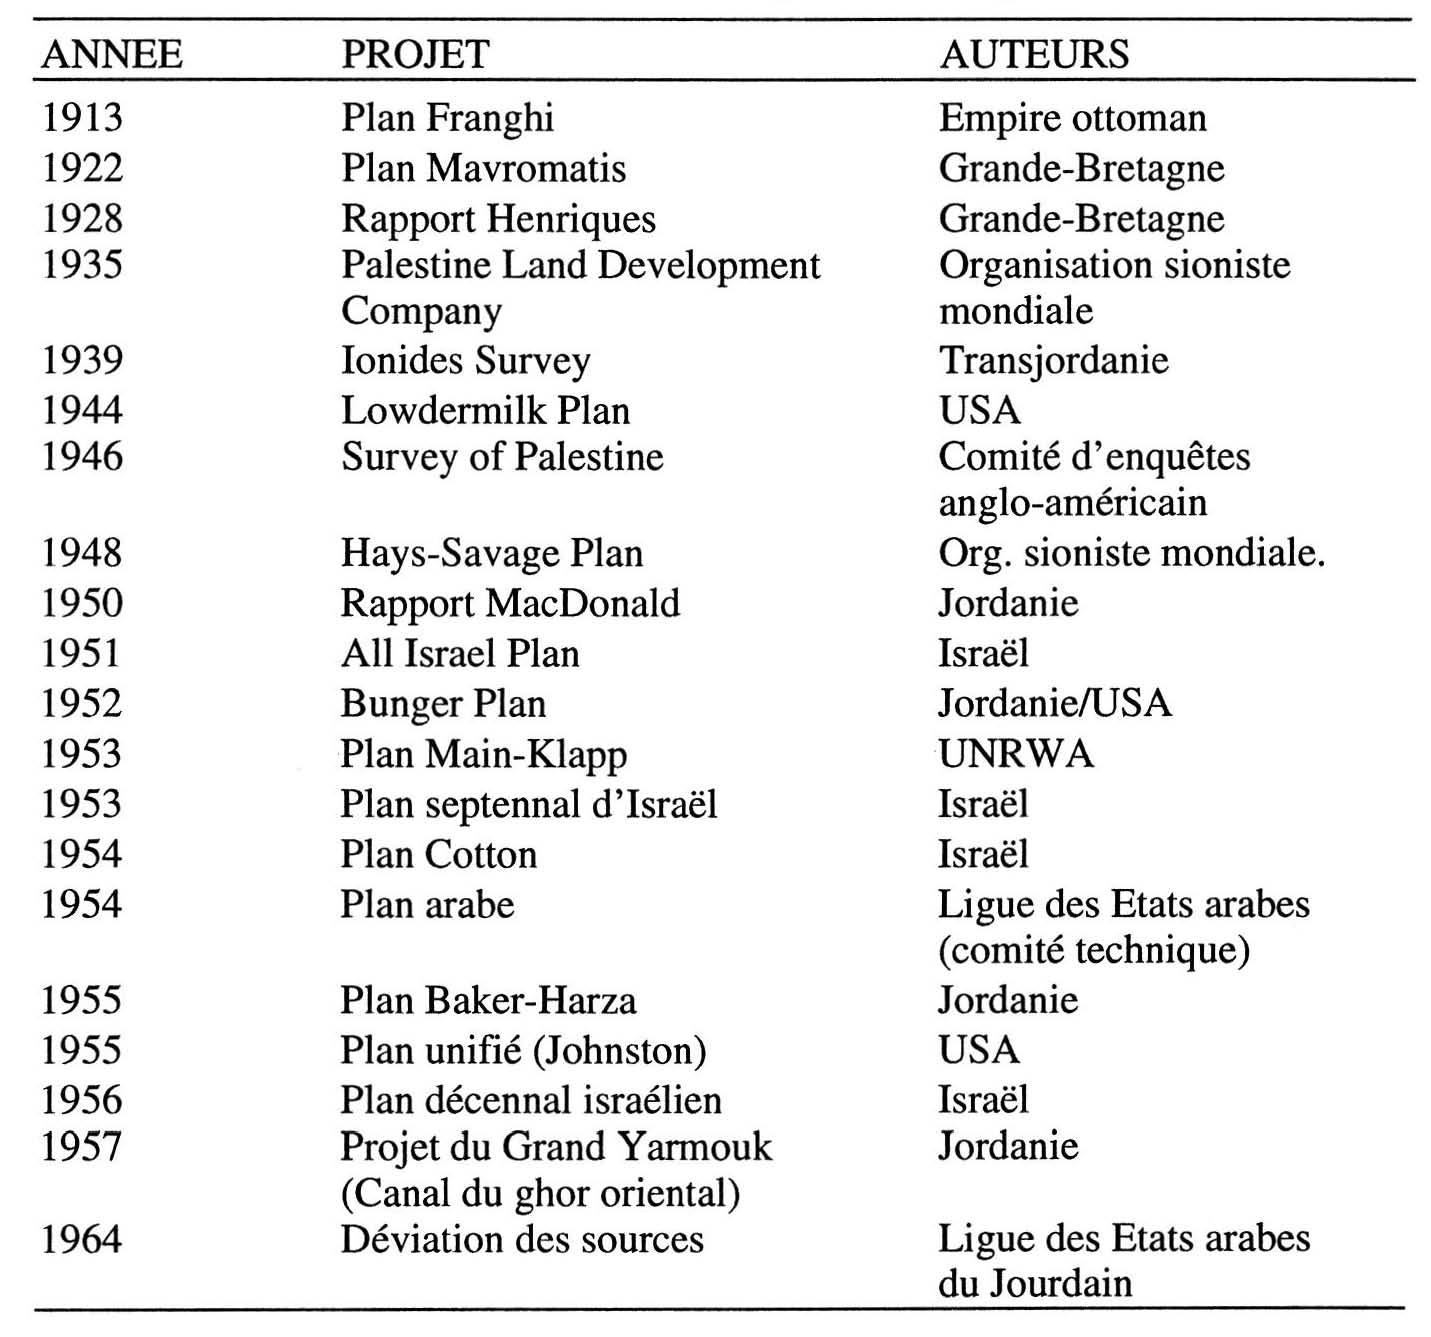 Rklapp Chronologie | Wiring Library